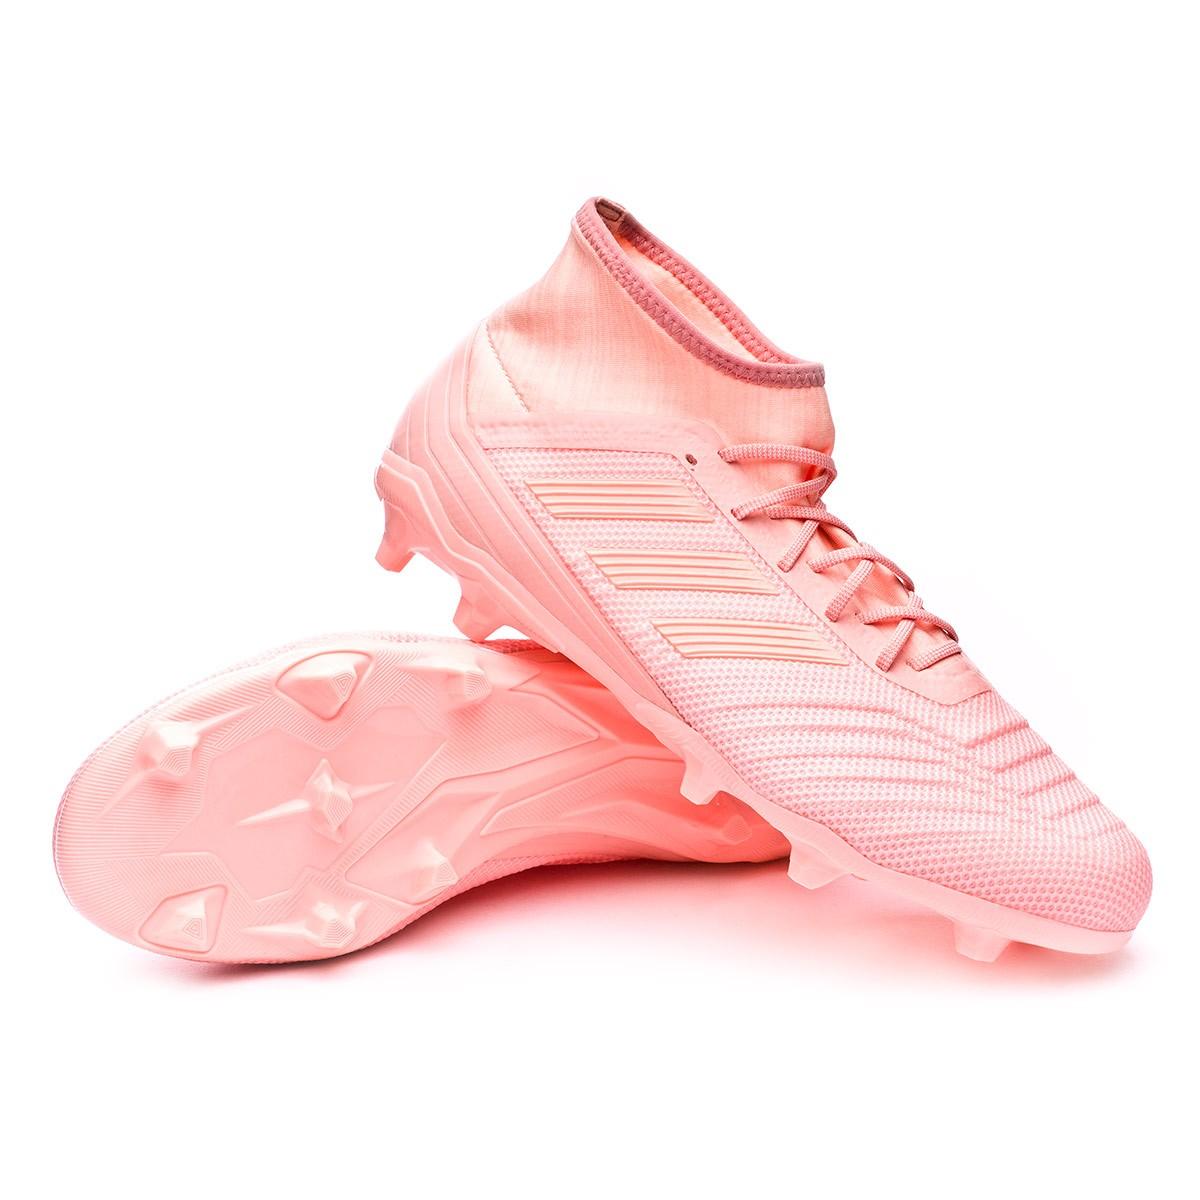 sale retailer f942a 2e11f ... Bota Predator 18.2 FG Clear orange-Trace pink. CATEGORY